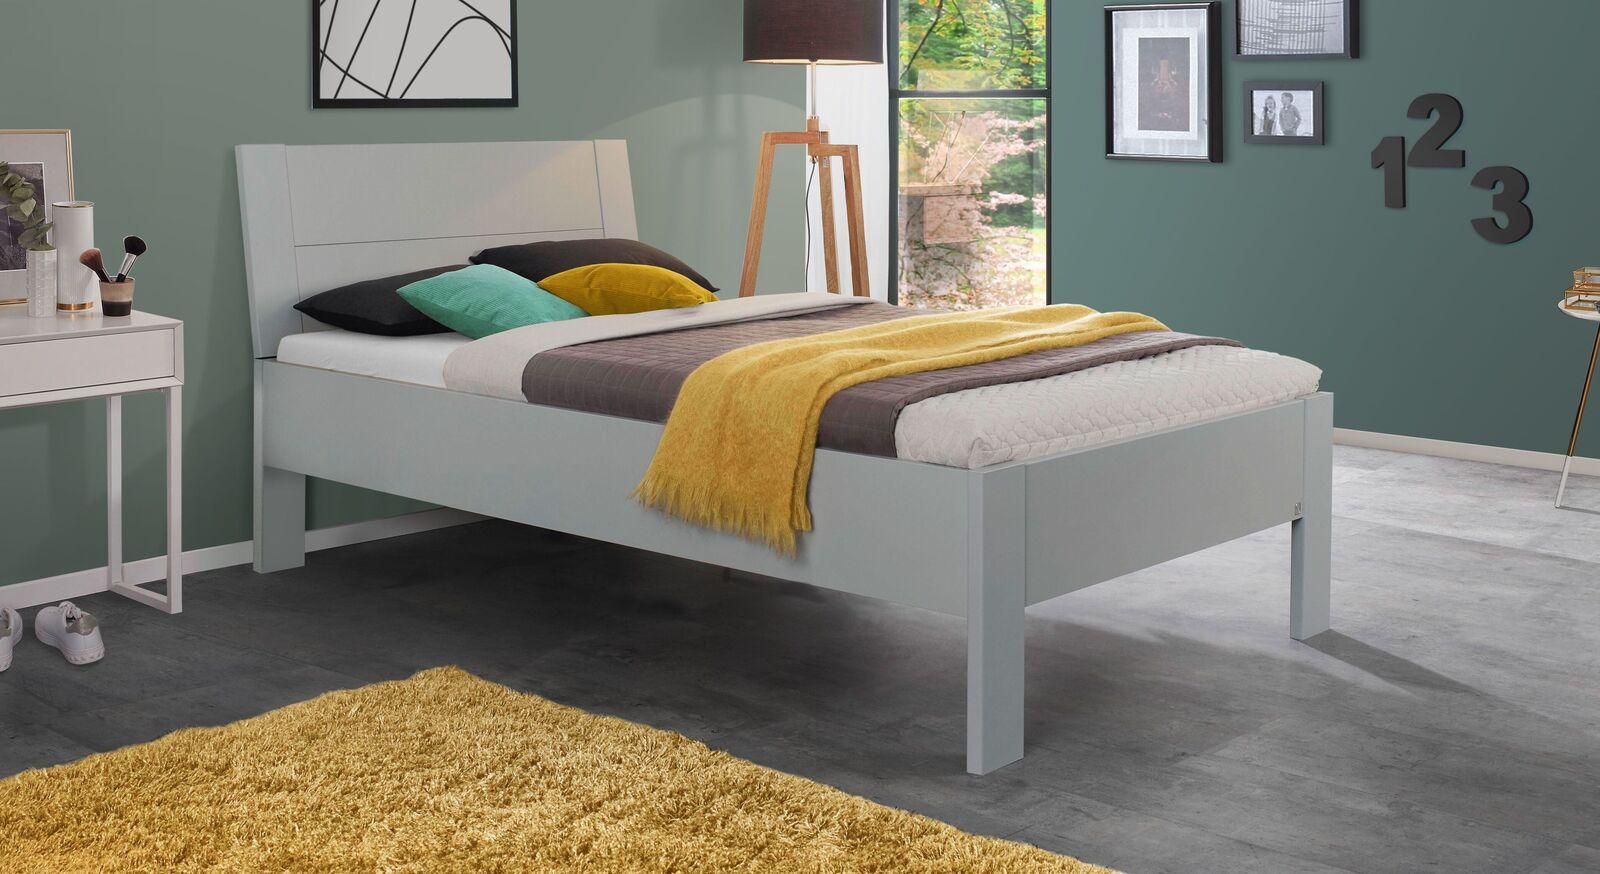 Preiswertes Bett Burana in Hellgrau